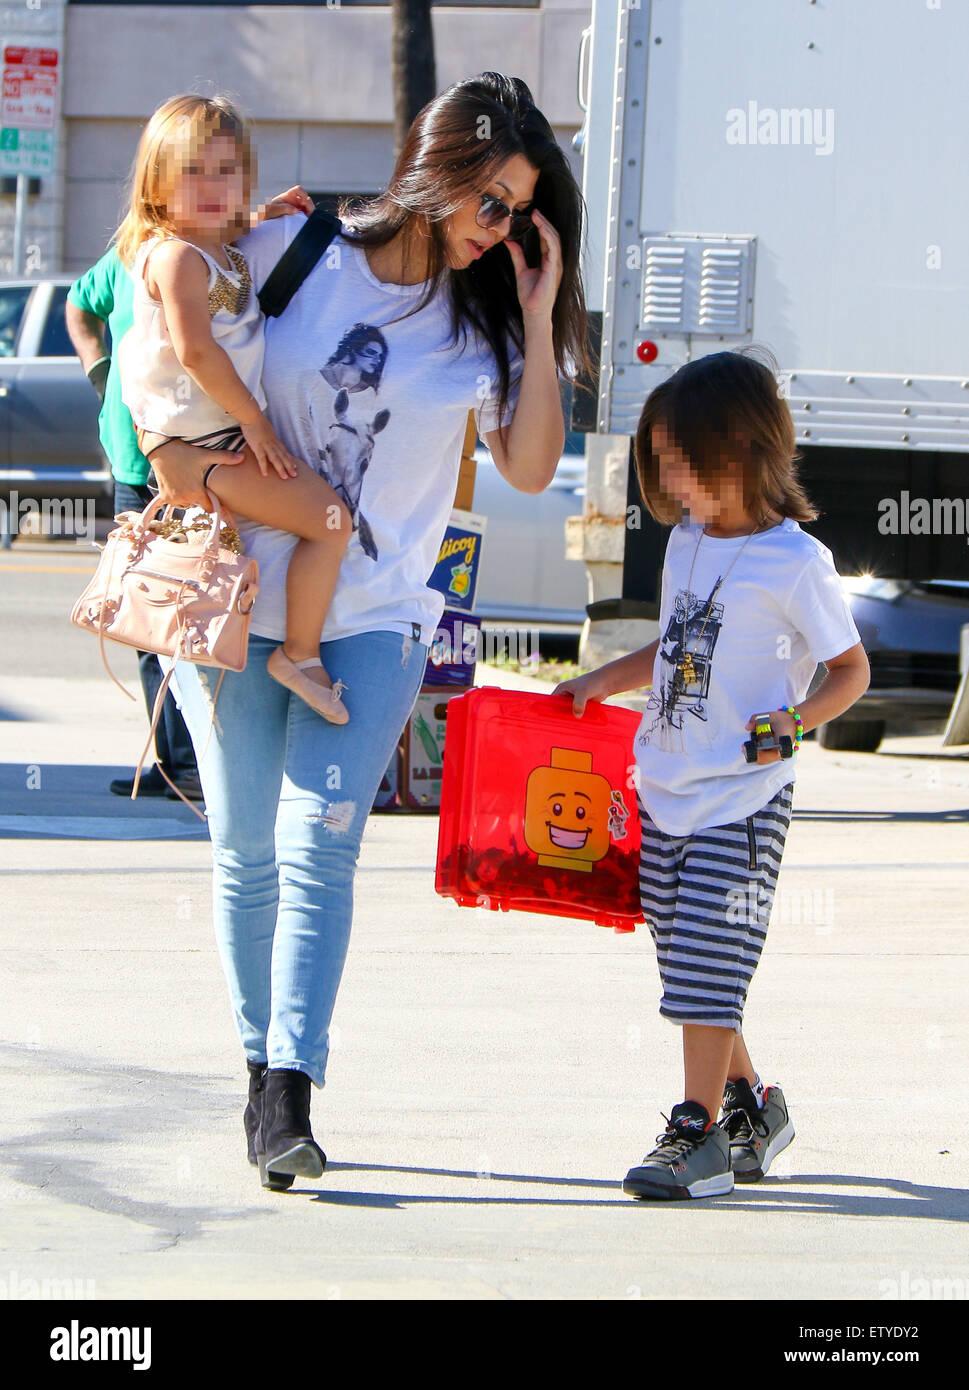 Kim Kardashian is back to black hair as she and Kourtney